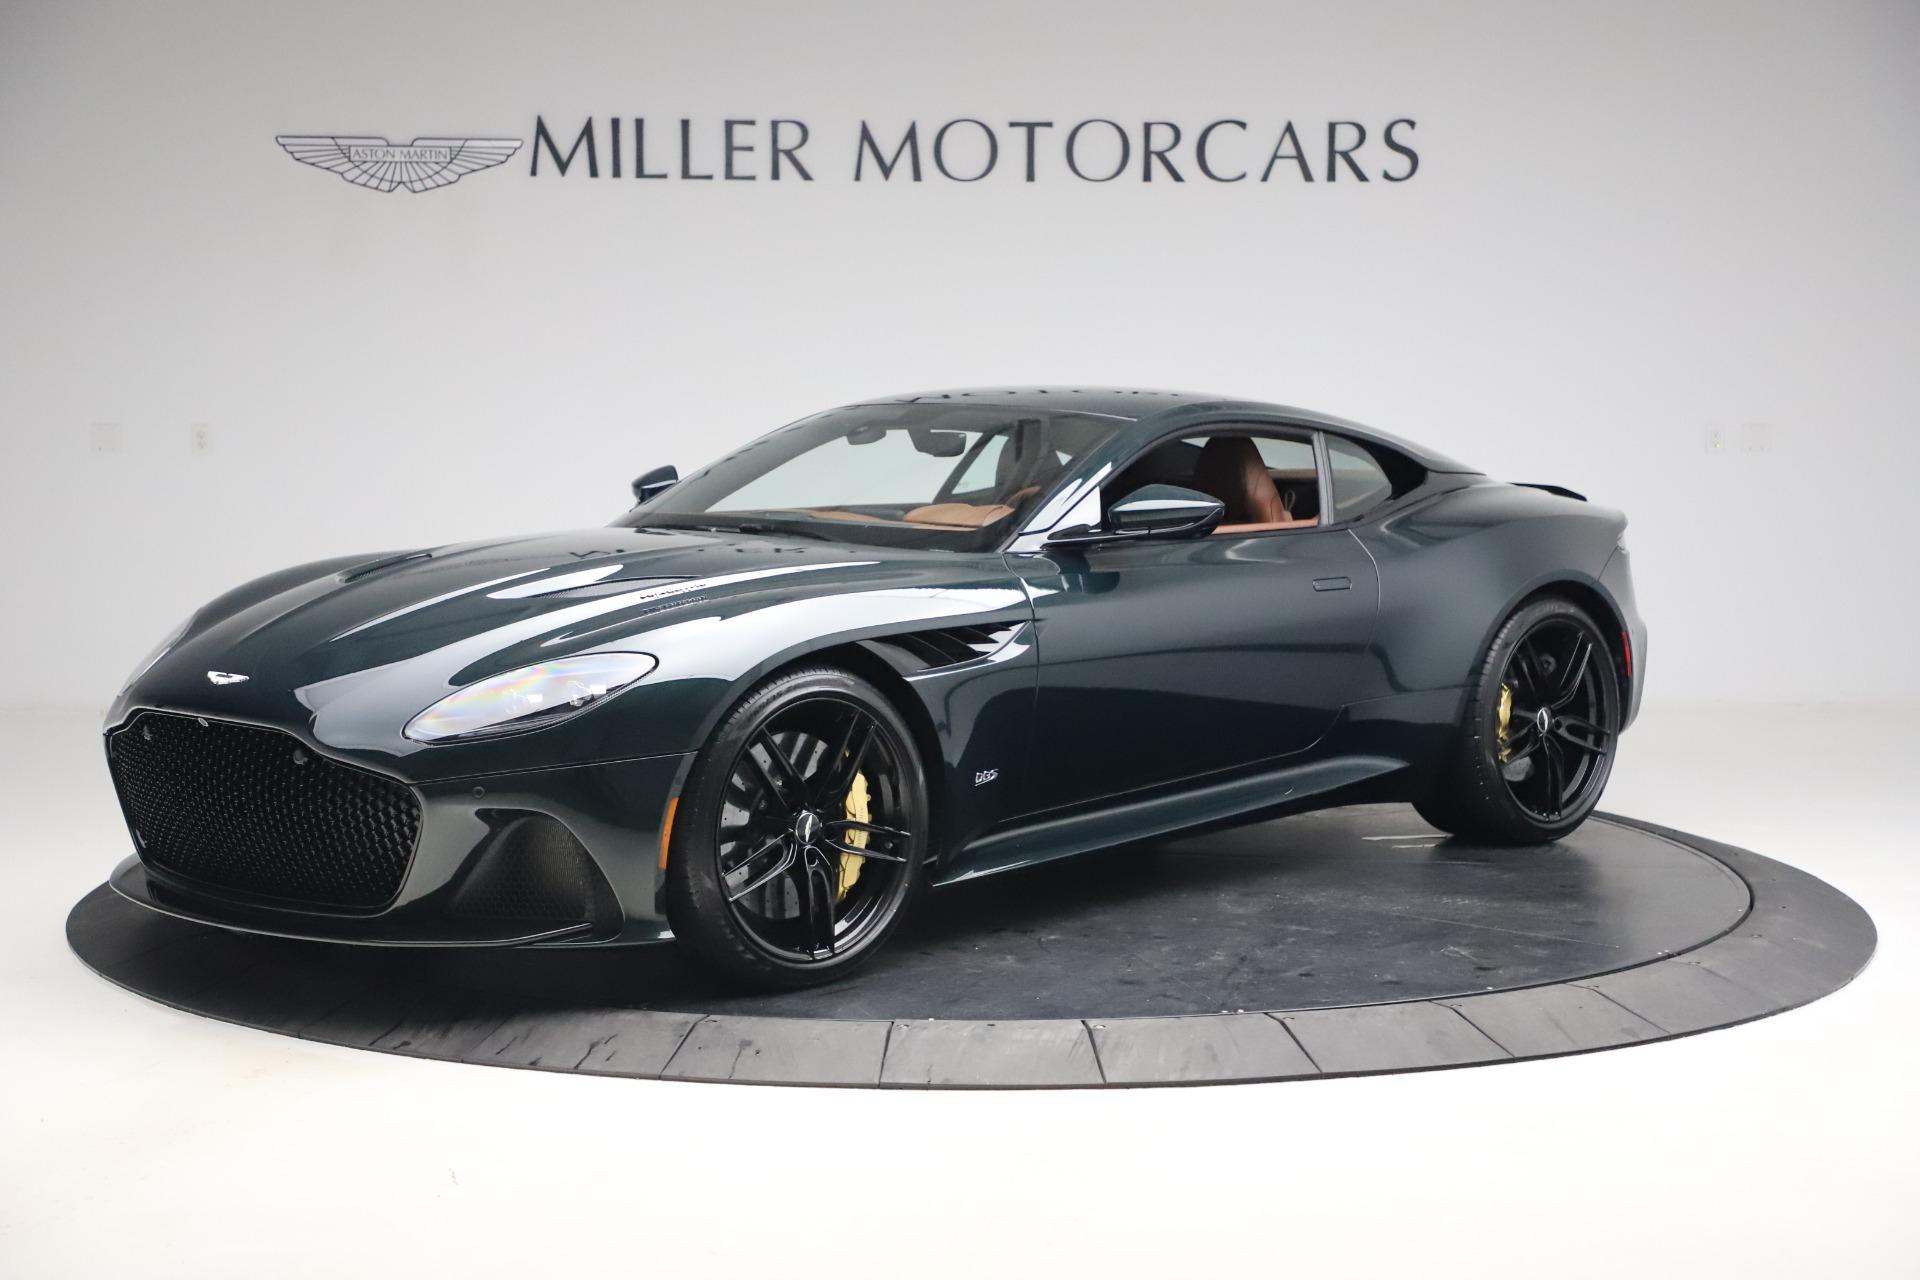 Used 2020 Aston Martin DBS Superleggera for sale $295,900 at Aston Martin of Greenwich in Greenwich CT 06830 1